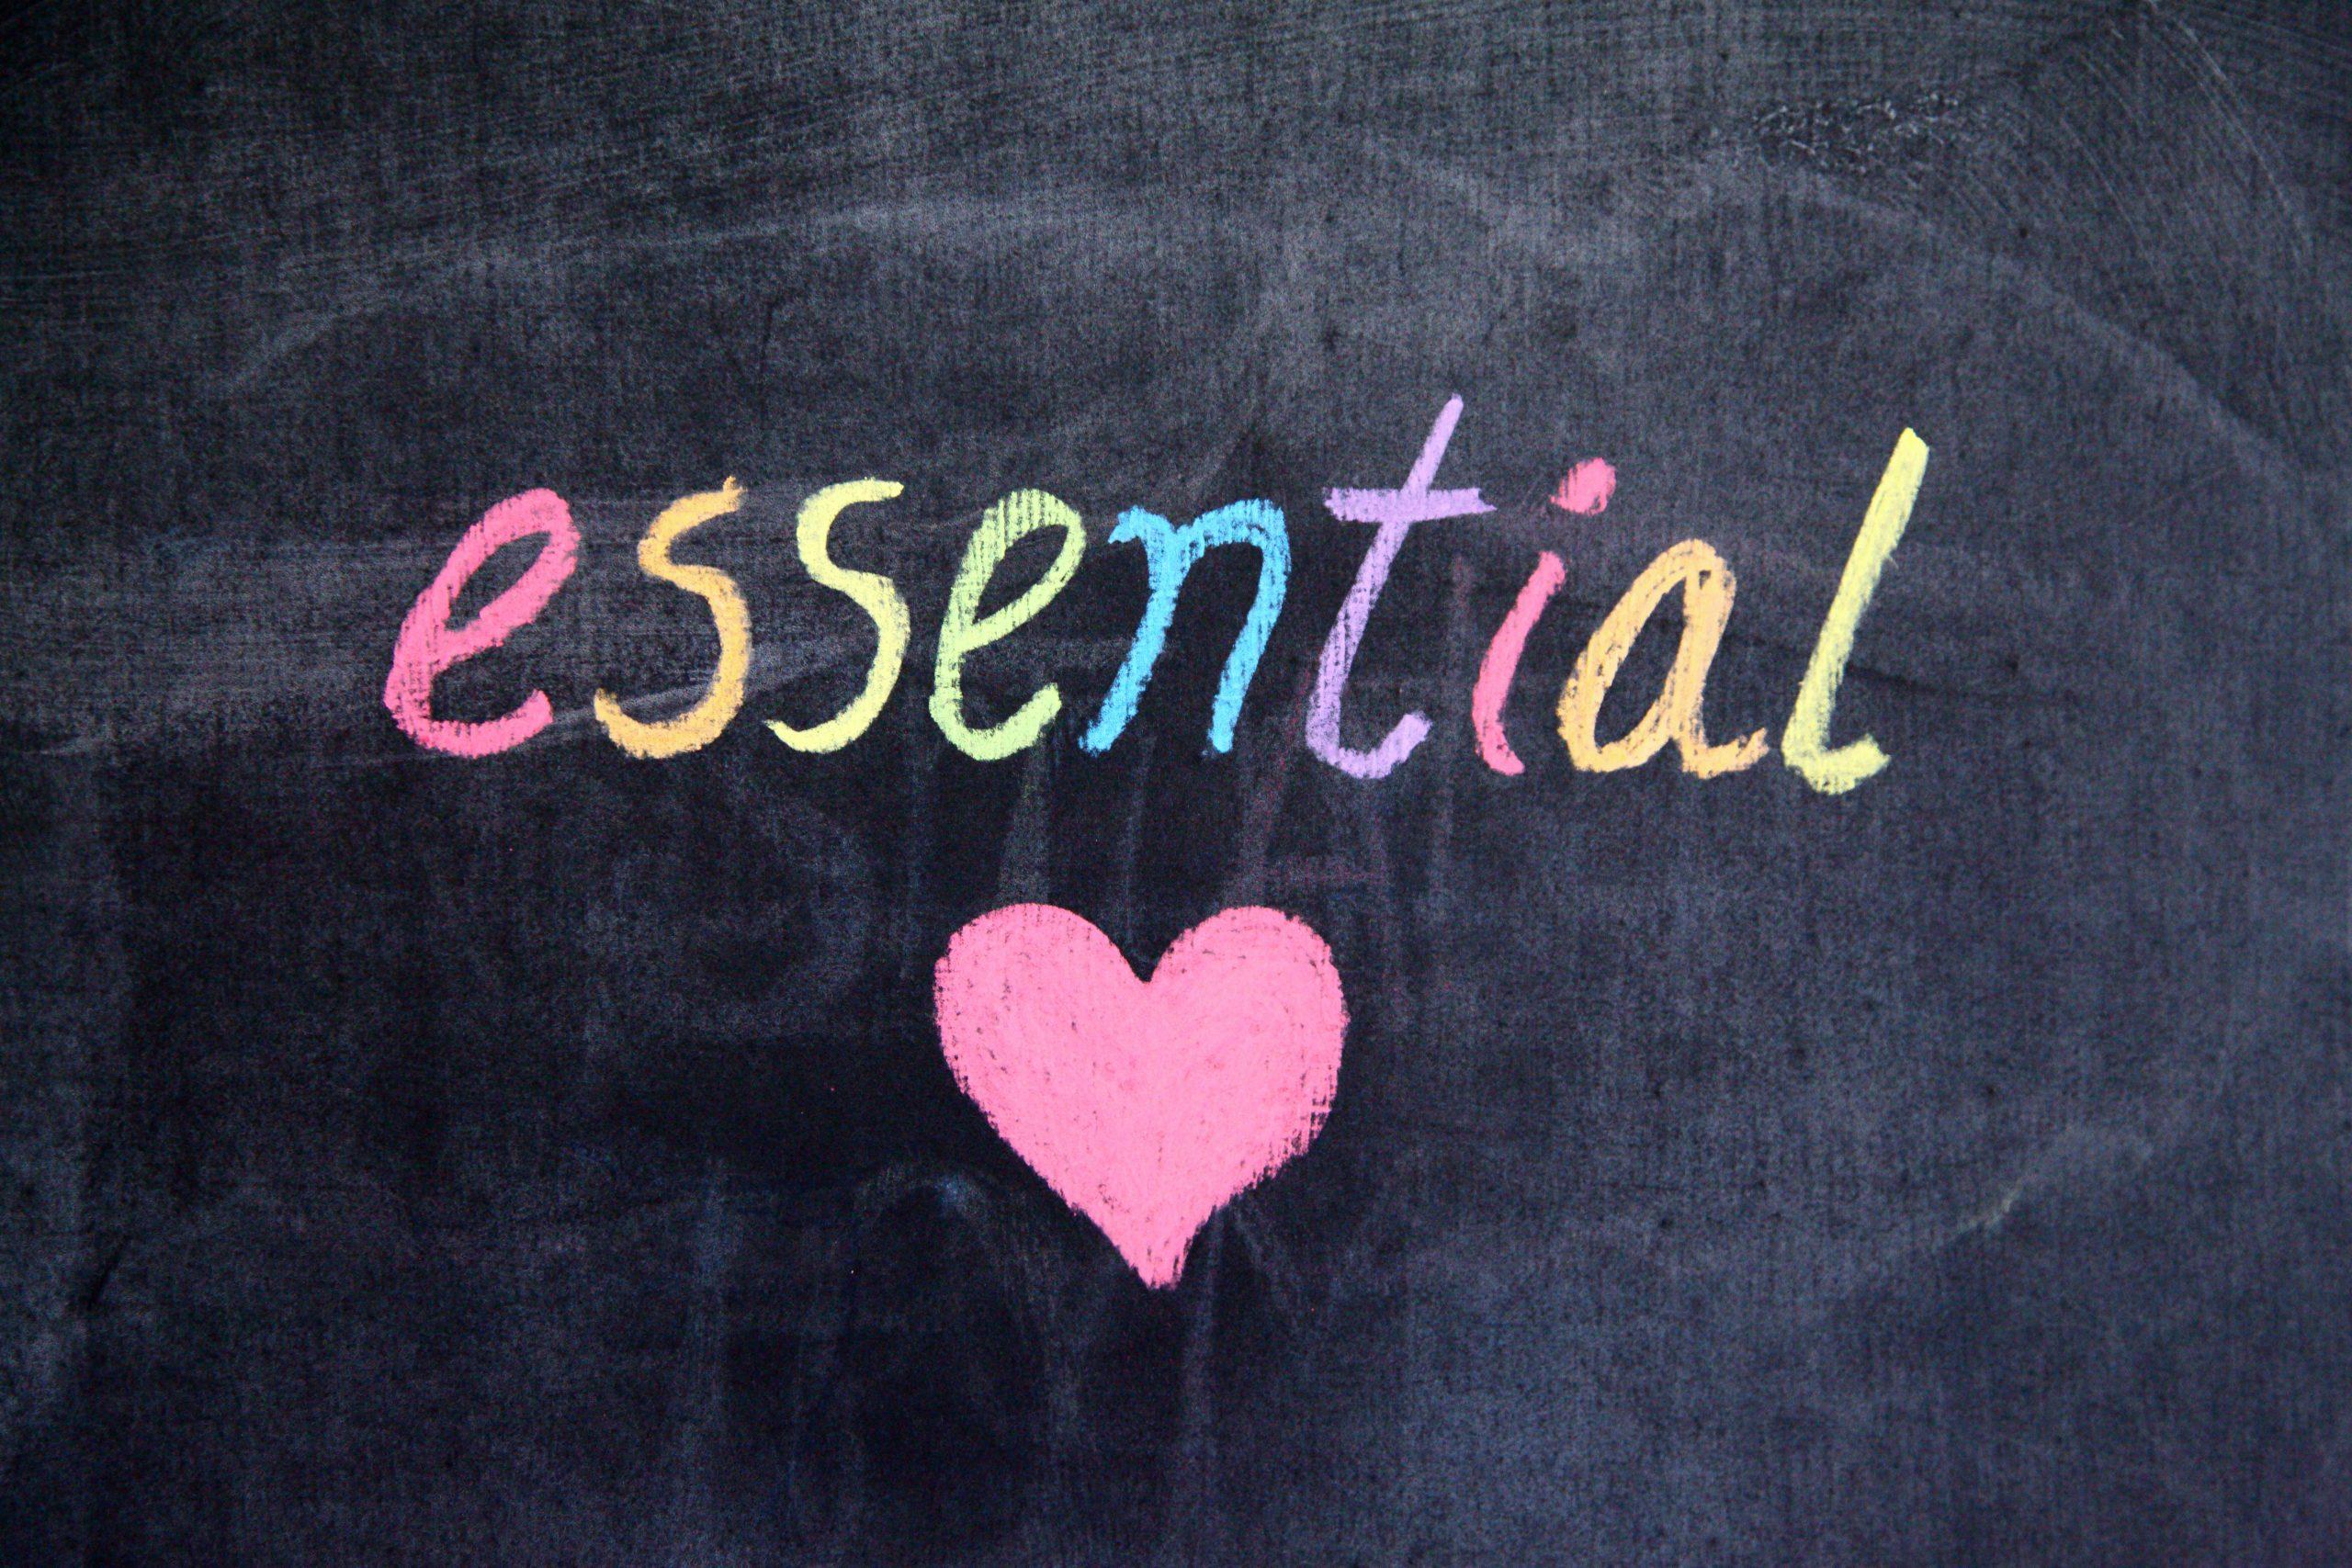 the work essential written in multicoloured chalk on black background